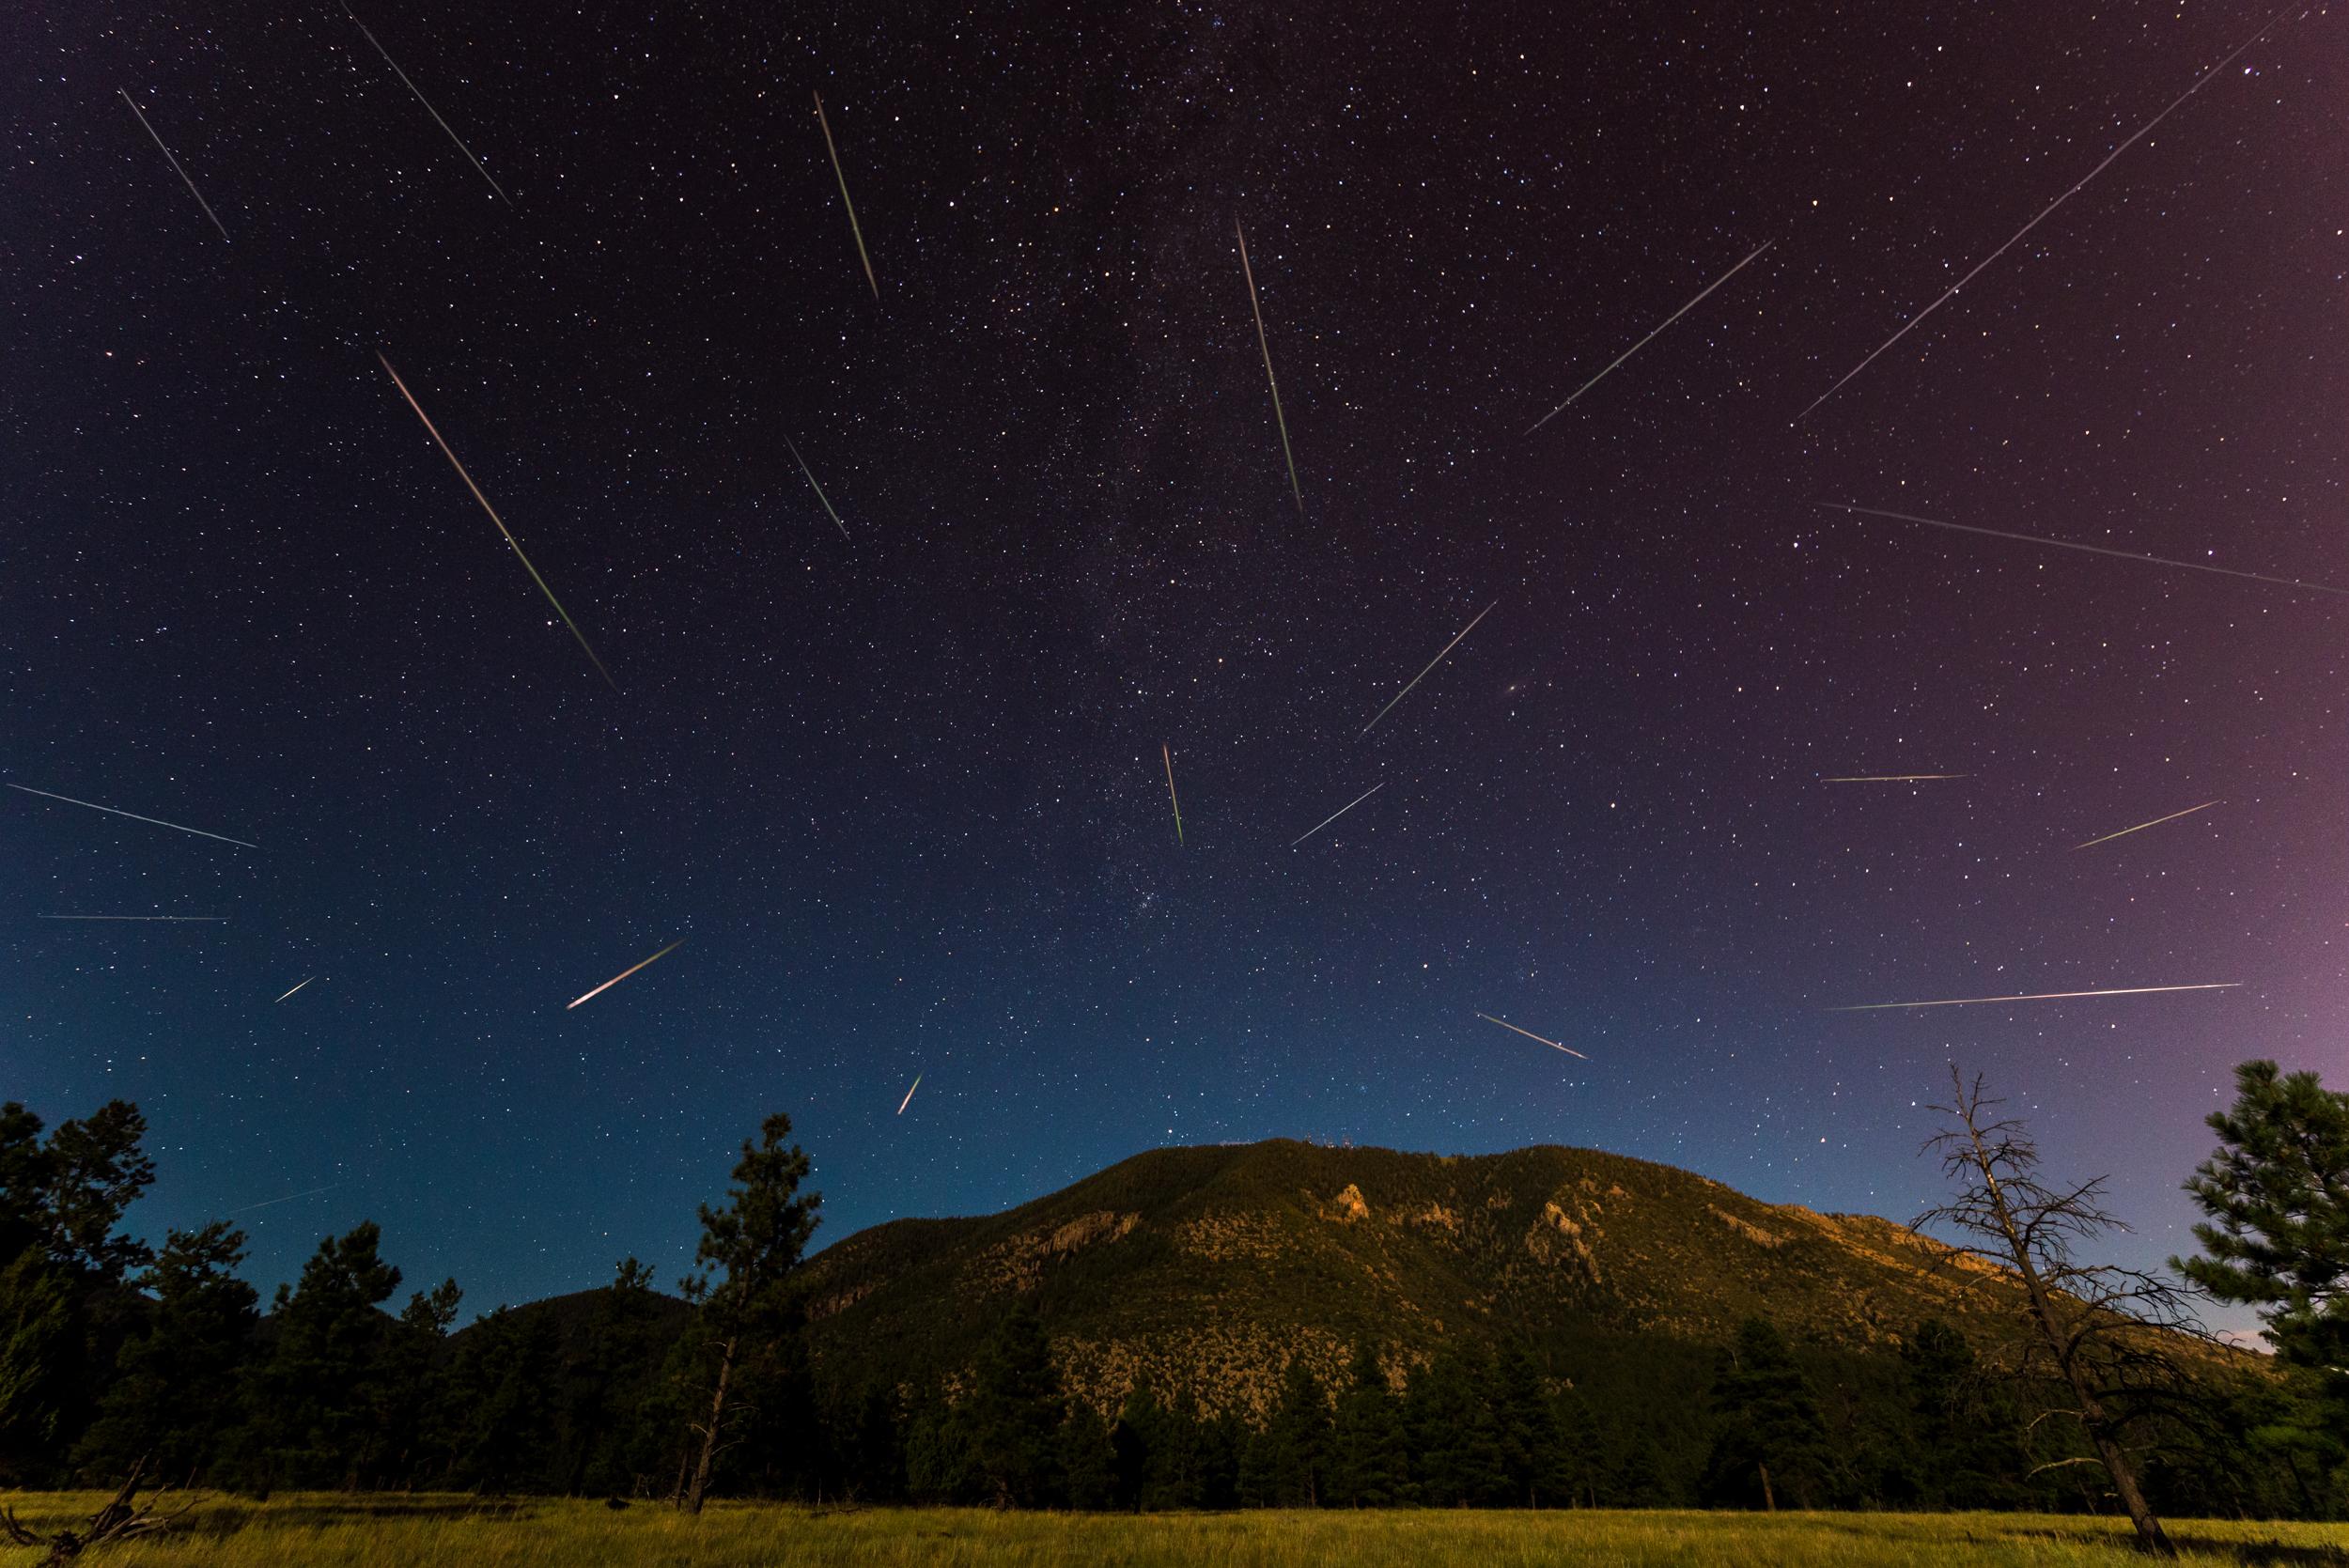 2016 Perseid Meteor Shower